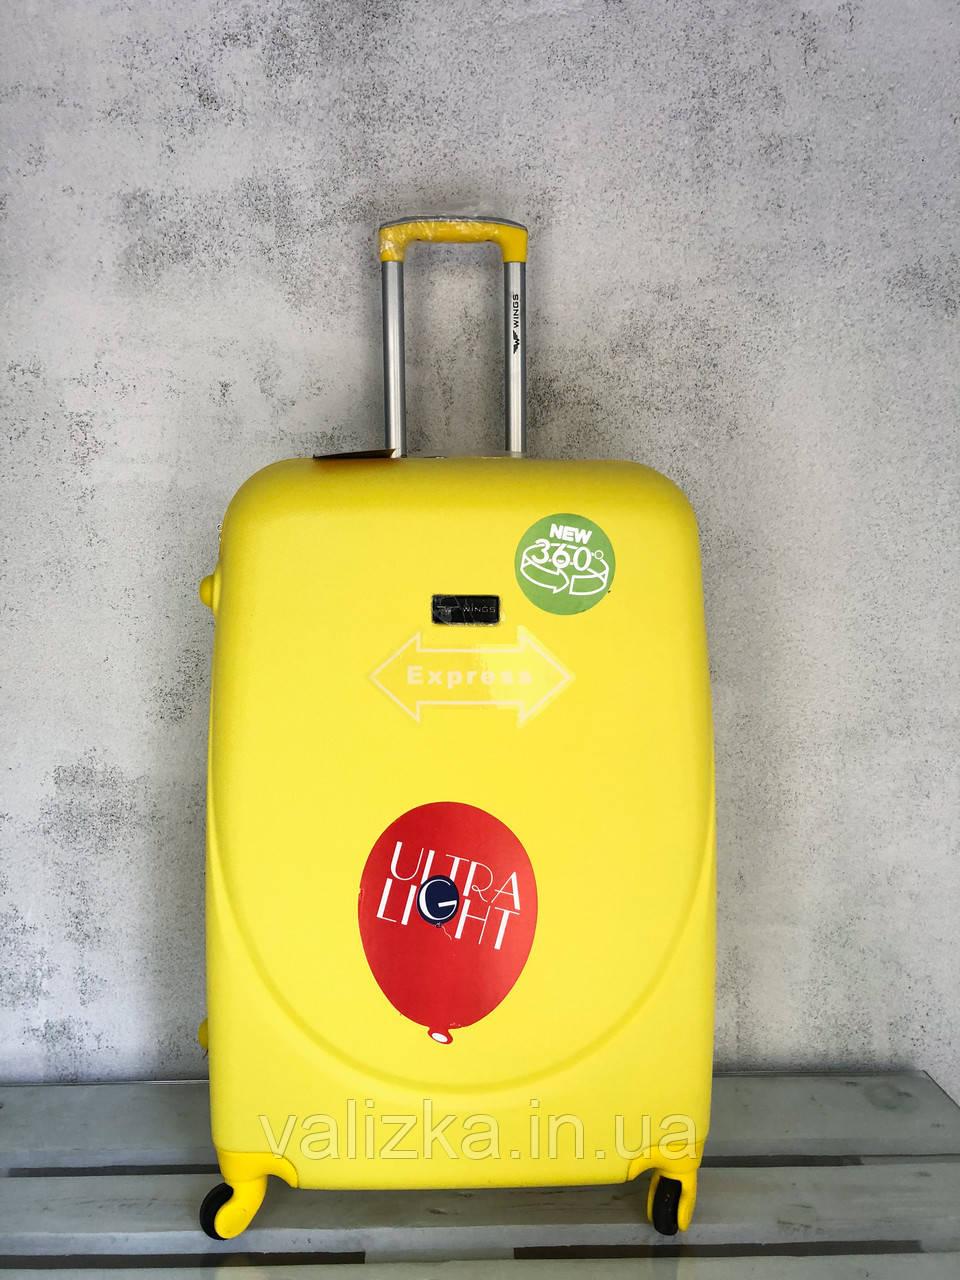 WINGS / Качество! Пластиковый чемодан на 4-х колесах большой чемодан / Велика пластикова валіза на колесах